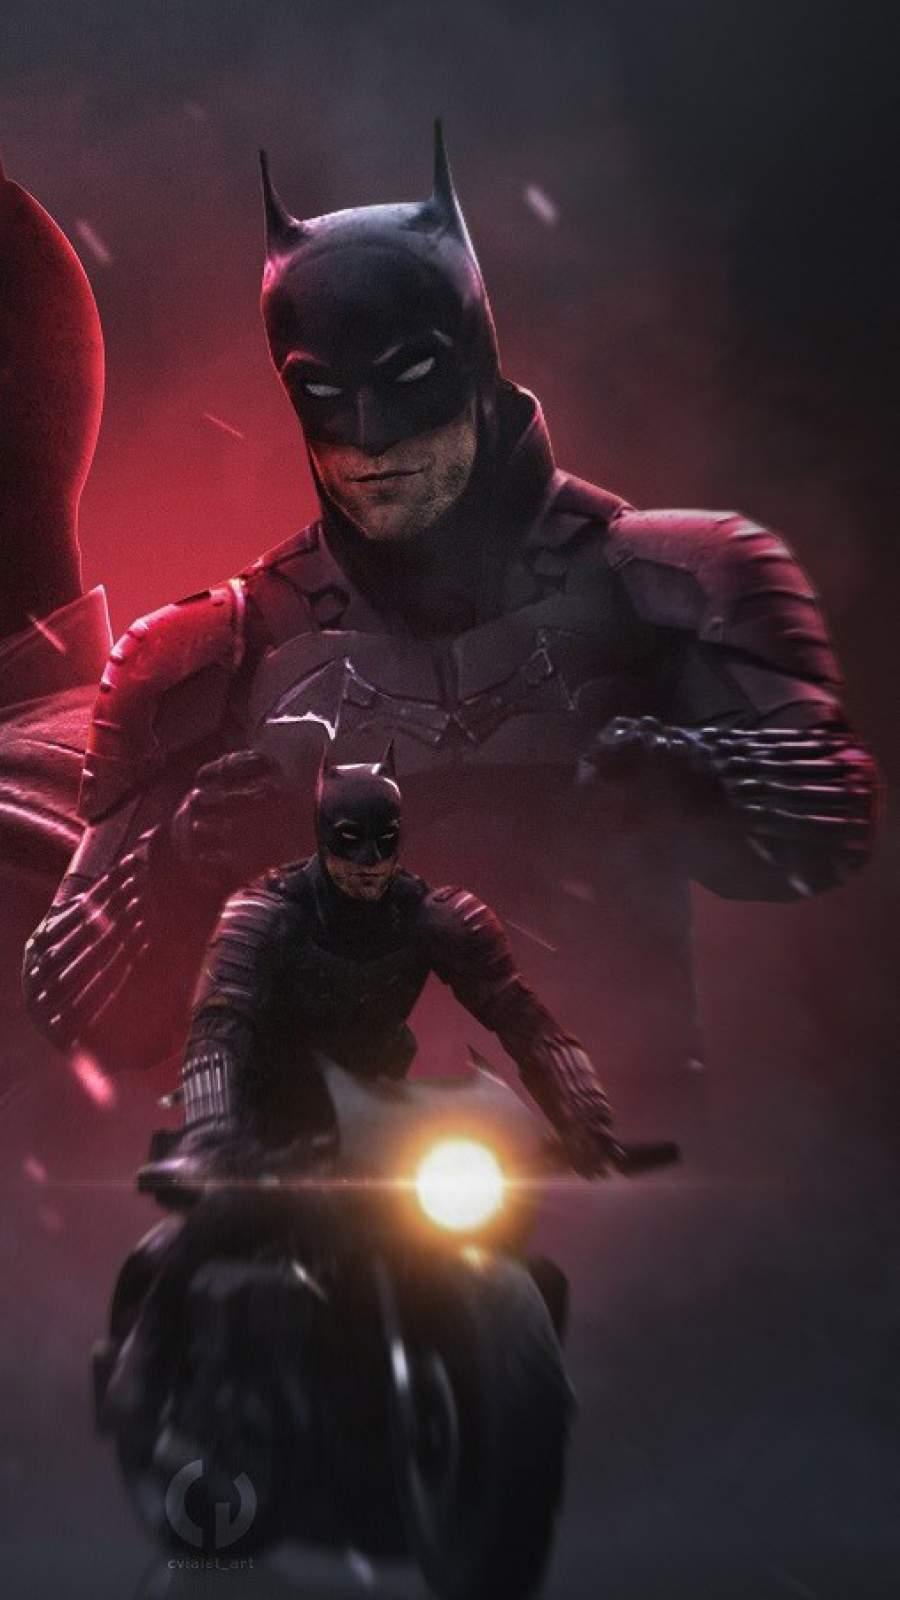 Batman Bike iPhone Wallpaper